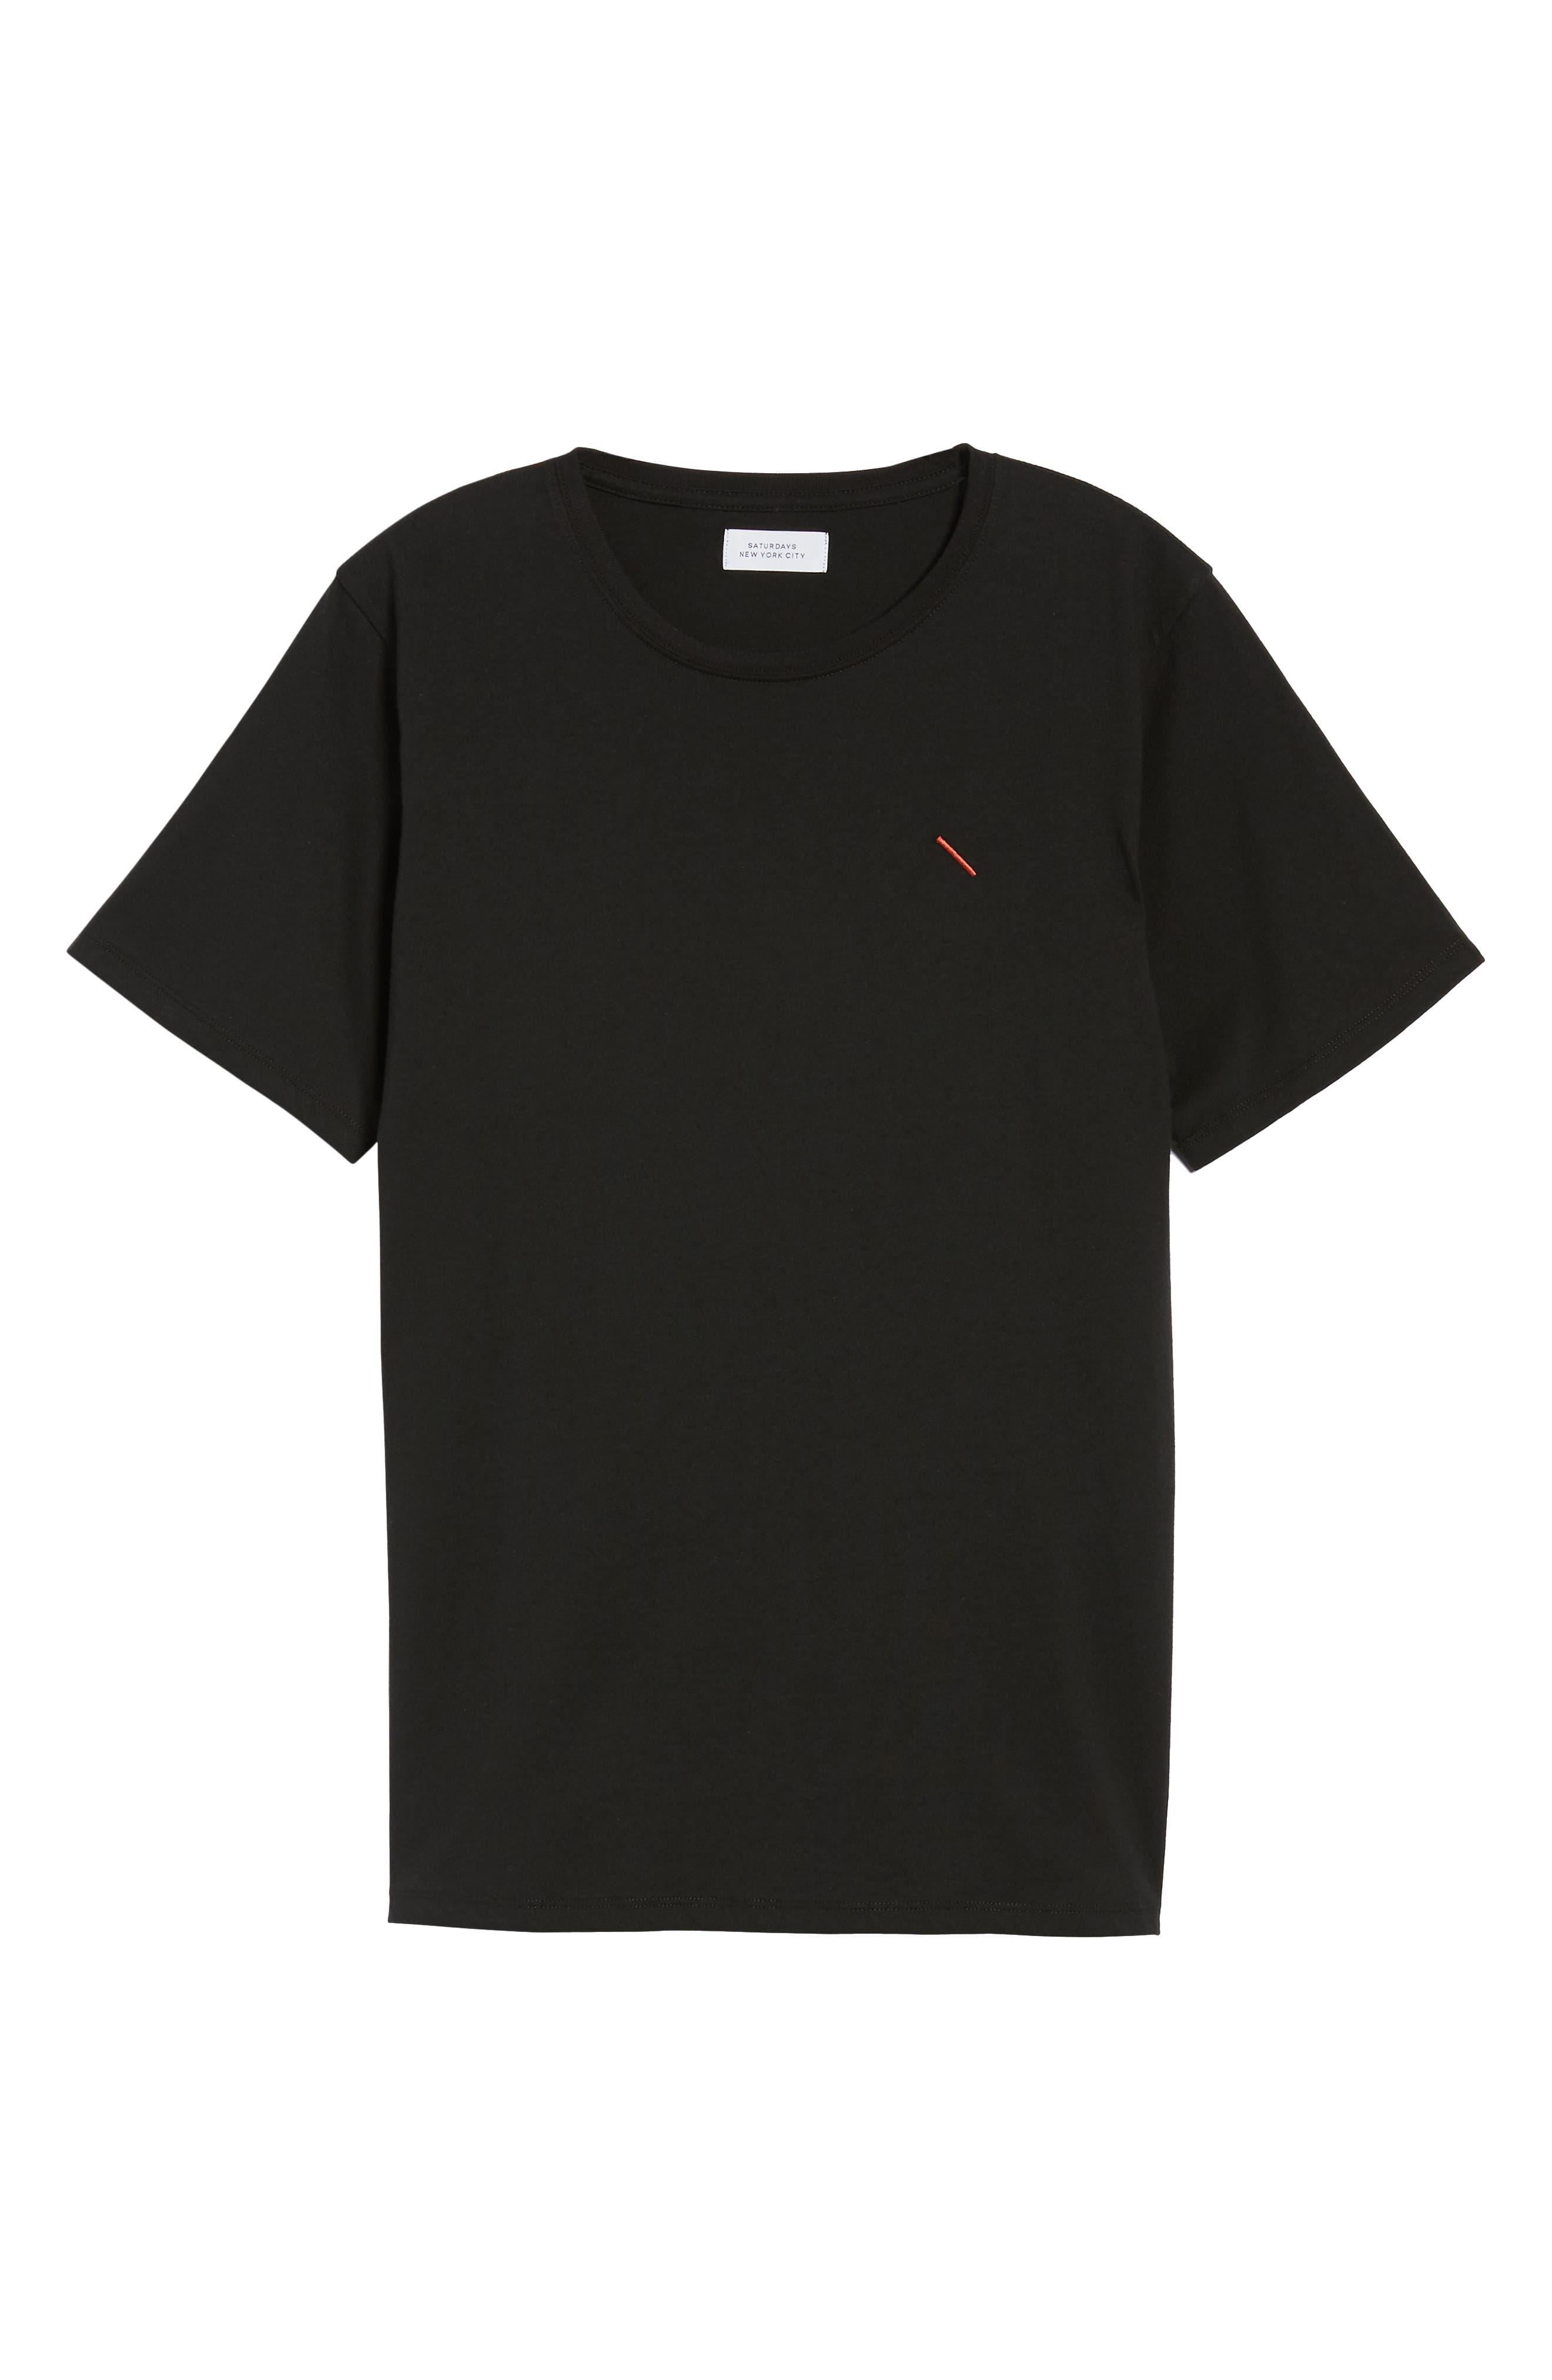 Embroidered Slash T-Shirt,                             Alternate thumbnail 6, color,                             Black